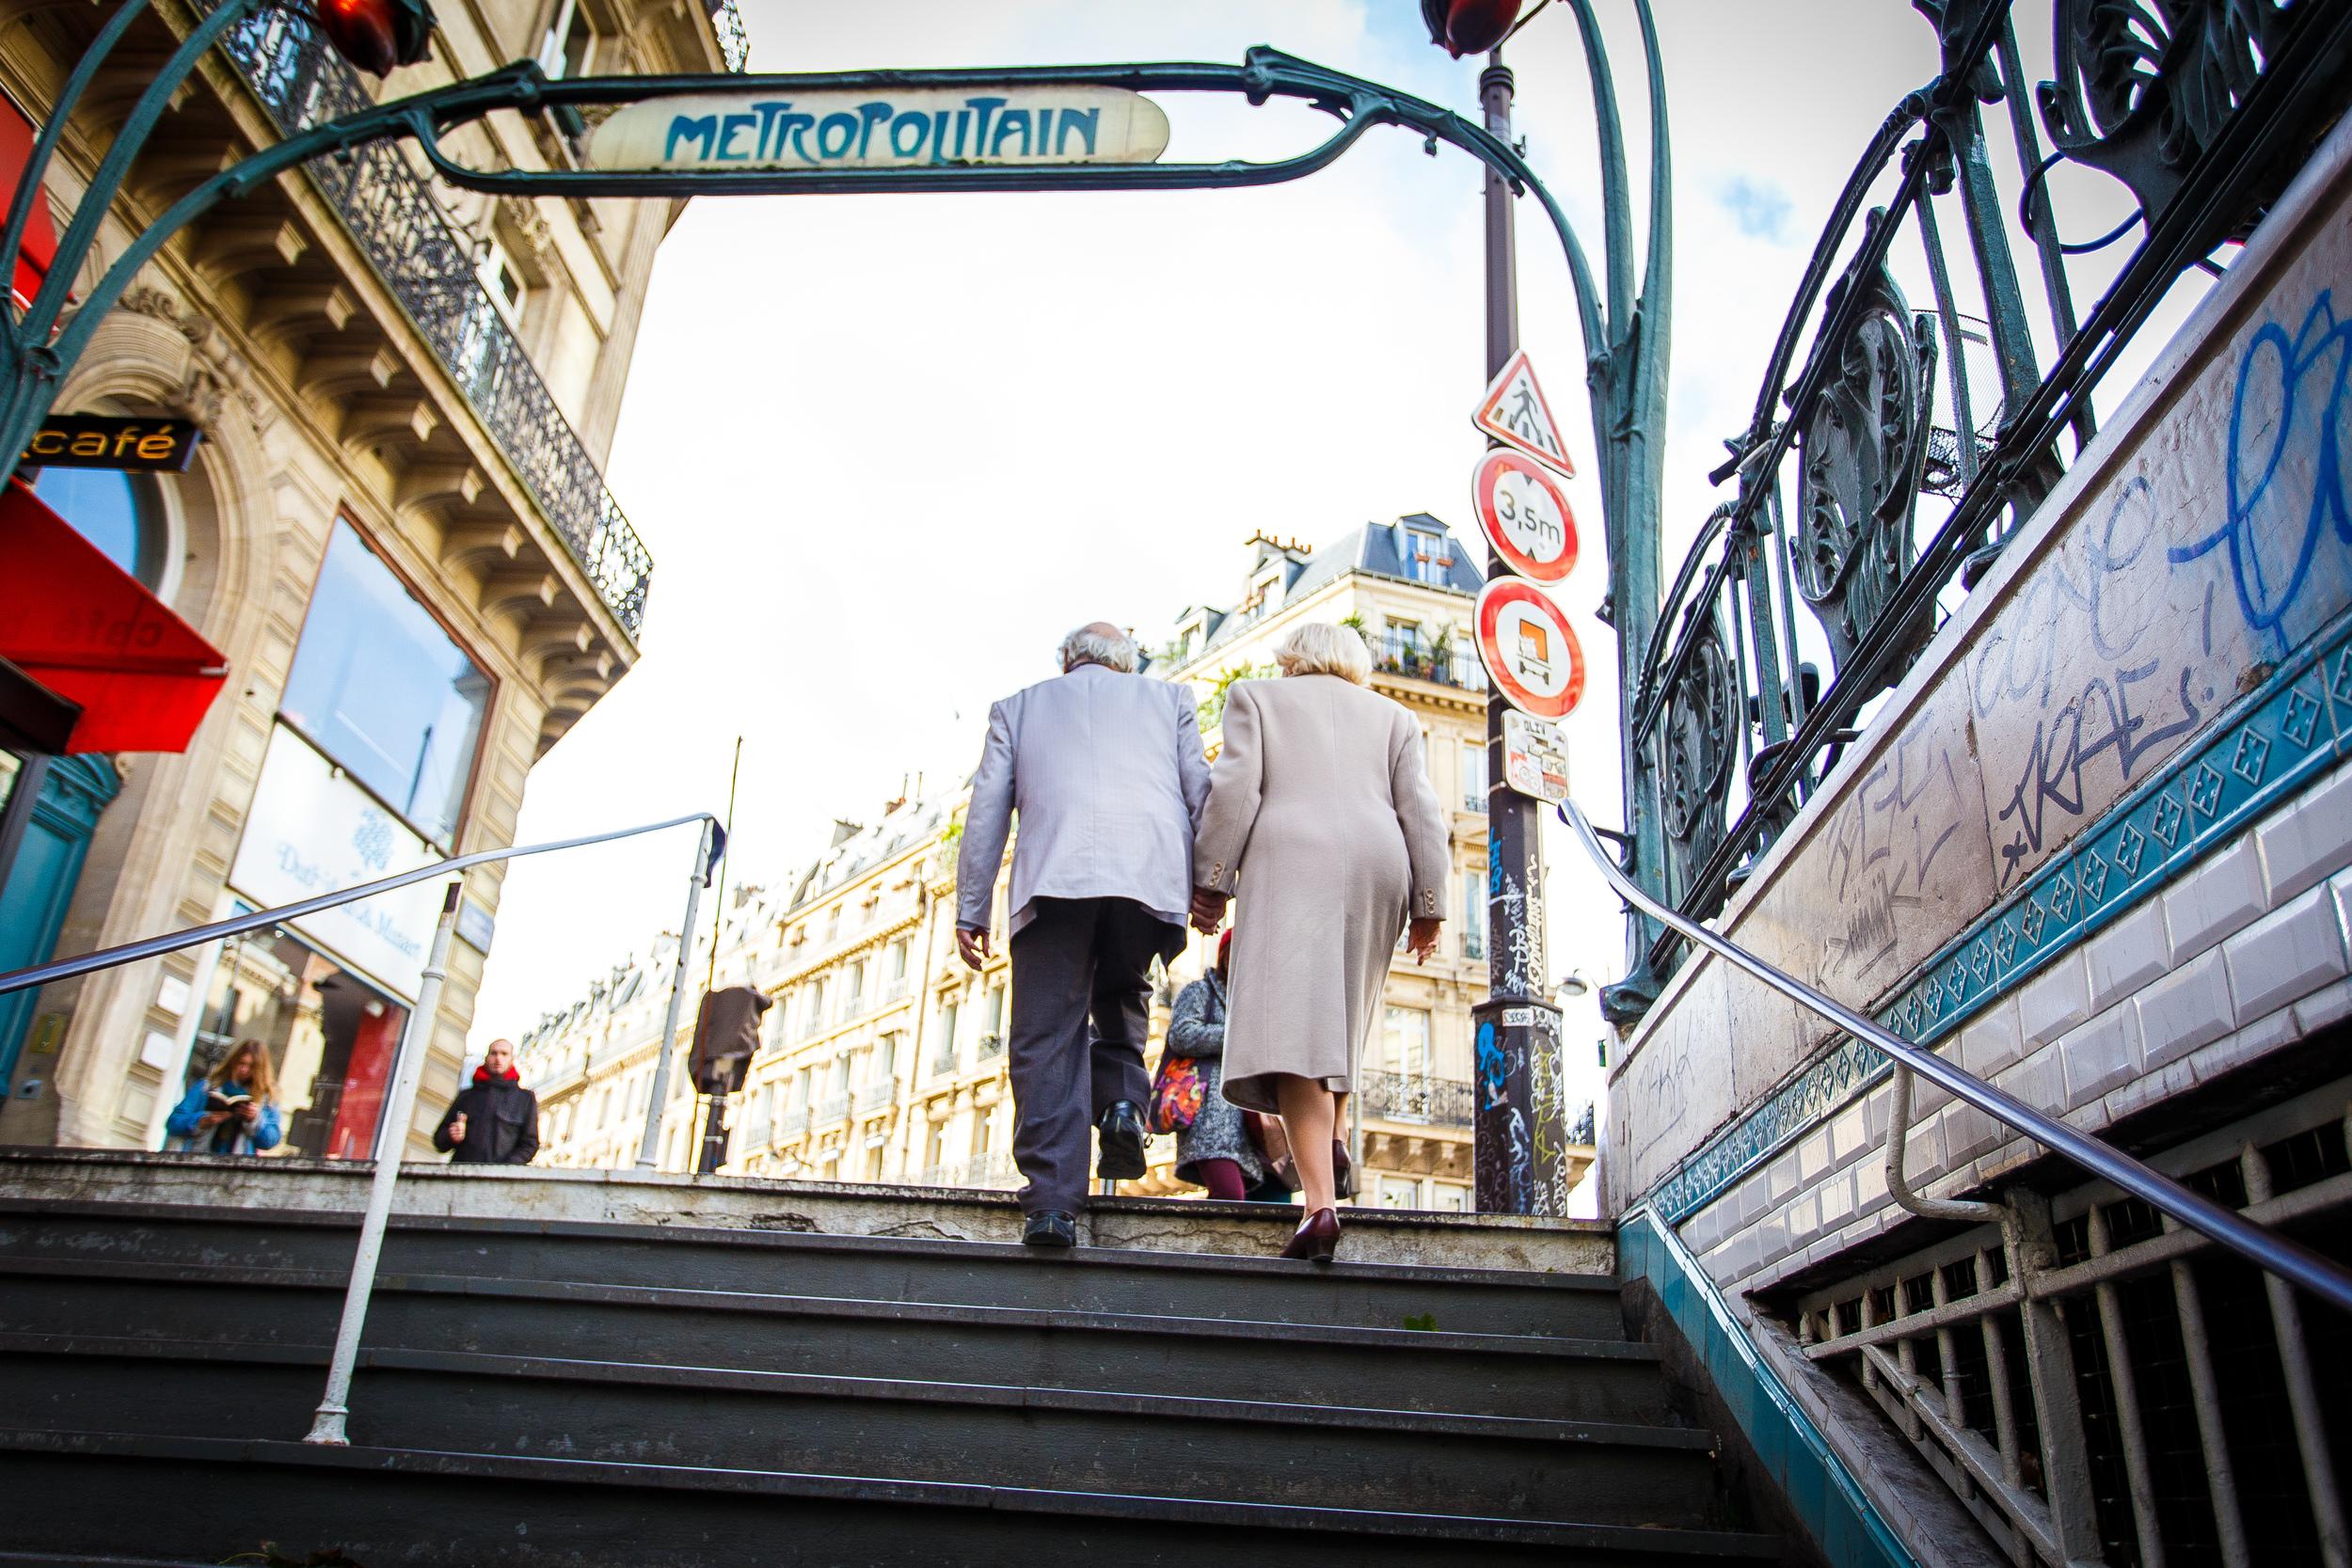 paris-2013 - 20131103 - 1242.jpg